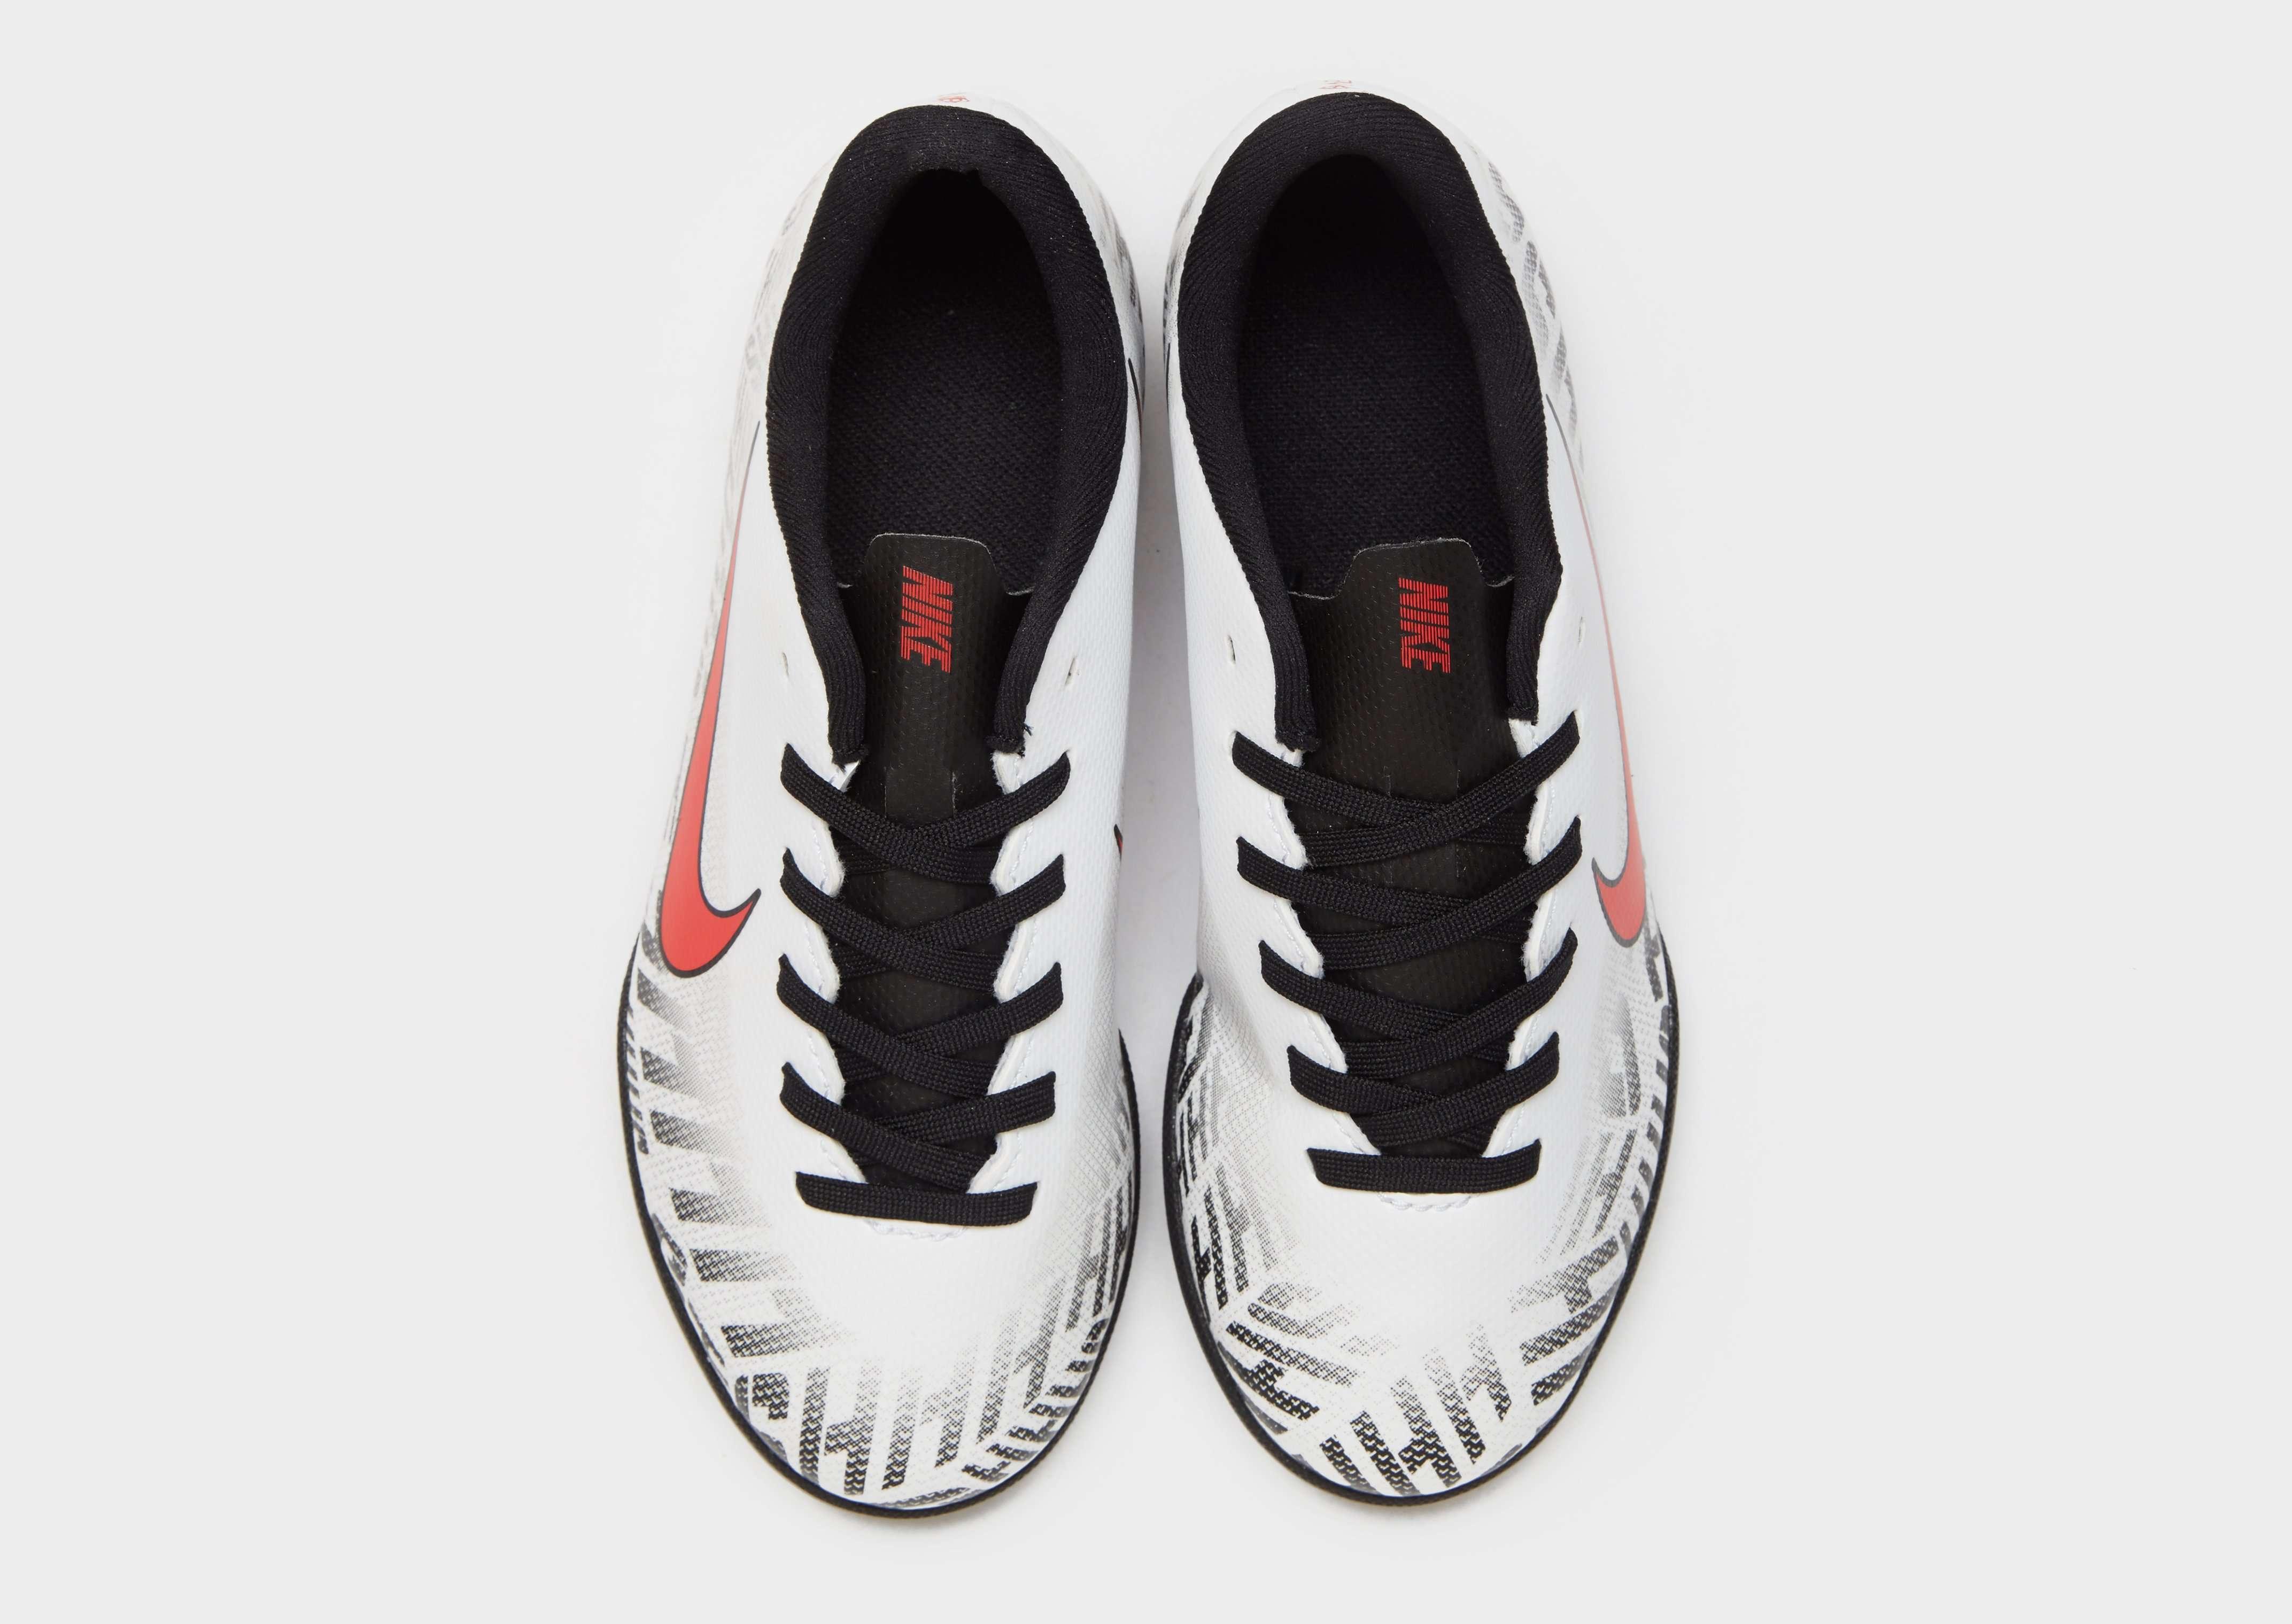 Nike Silencio Mercurial Vapor Club Neymar TF Children